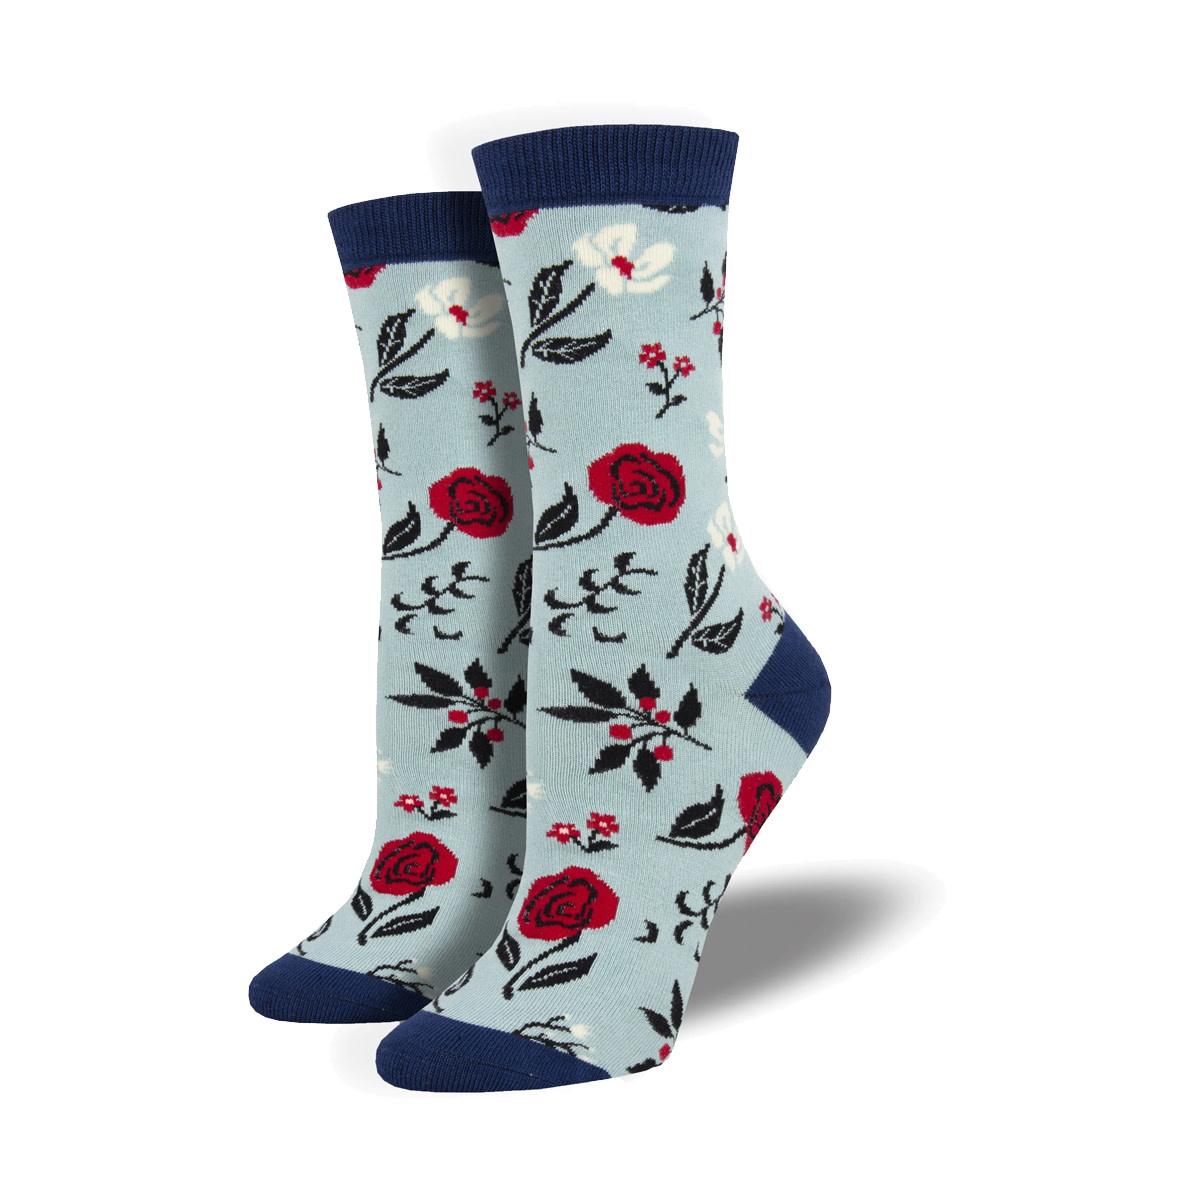 Socksmith Socksmith Women's Bamboo Socks Floral Motif Blue W 5 - 10.5